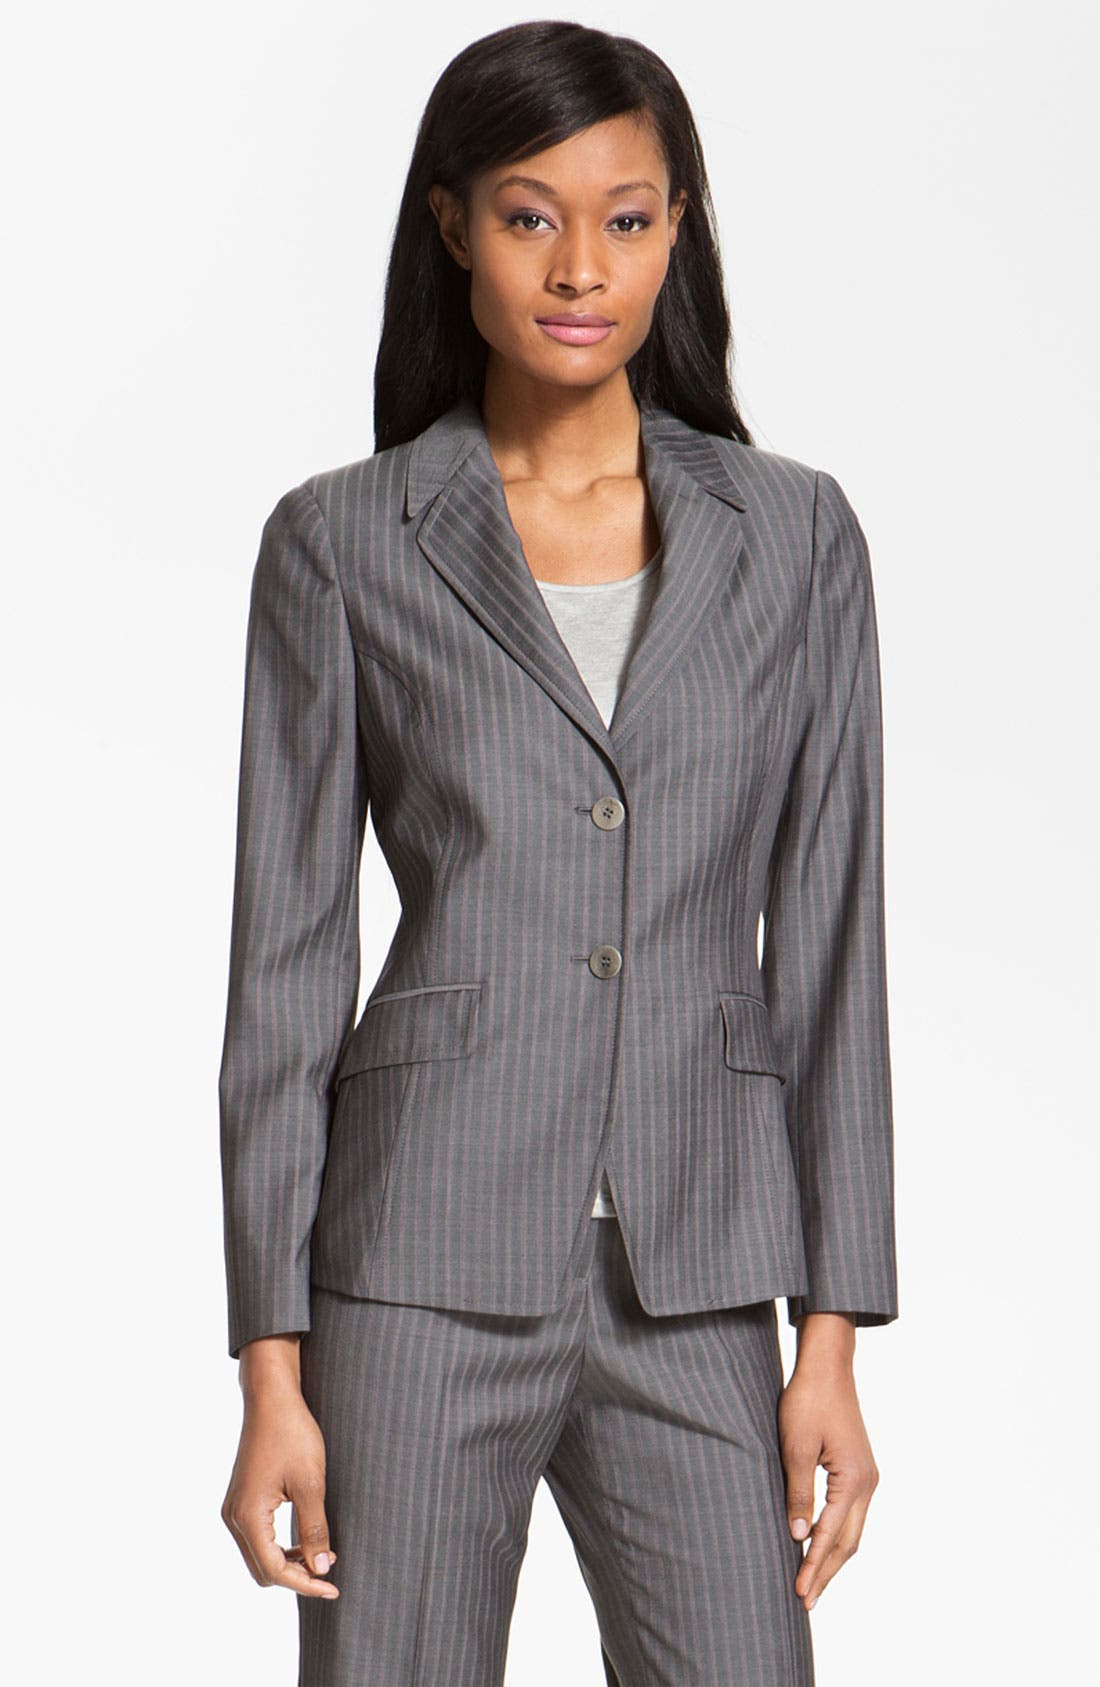 Alternate Image 1 Selected - Santorelli 'Vicky' Wool Jacket